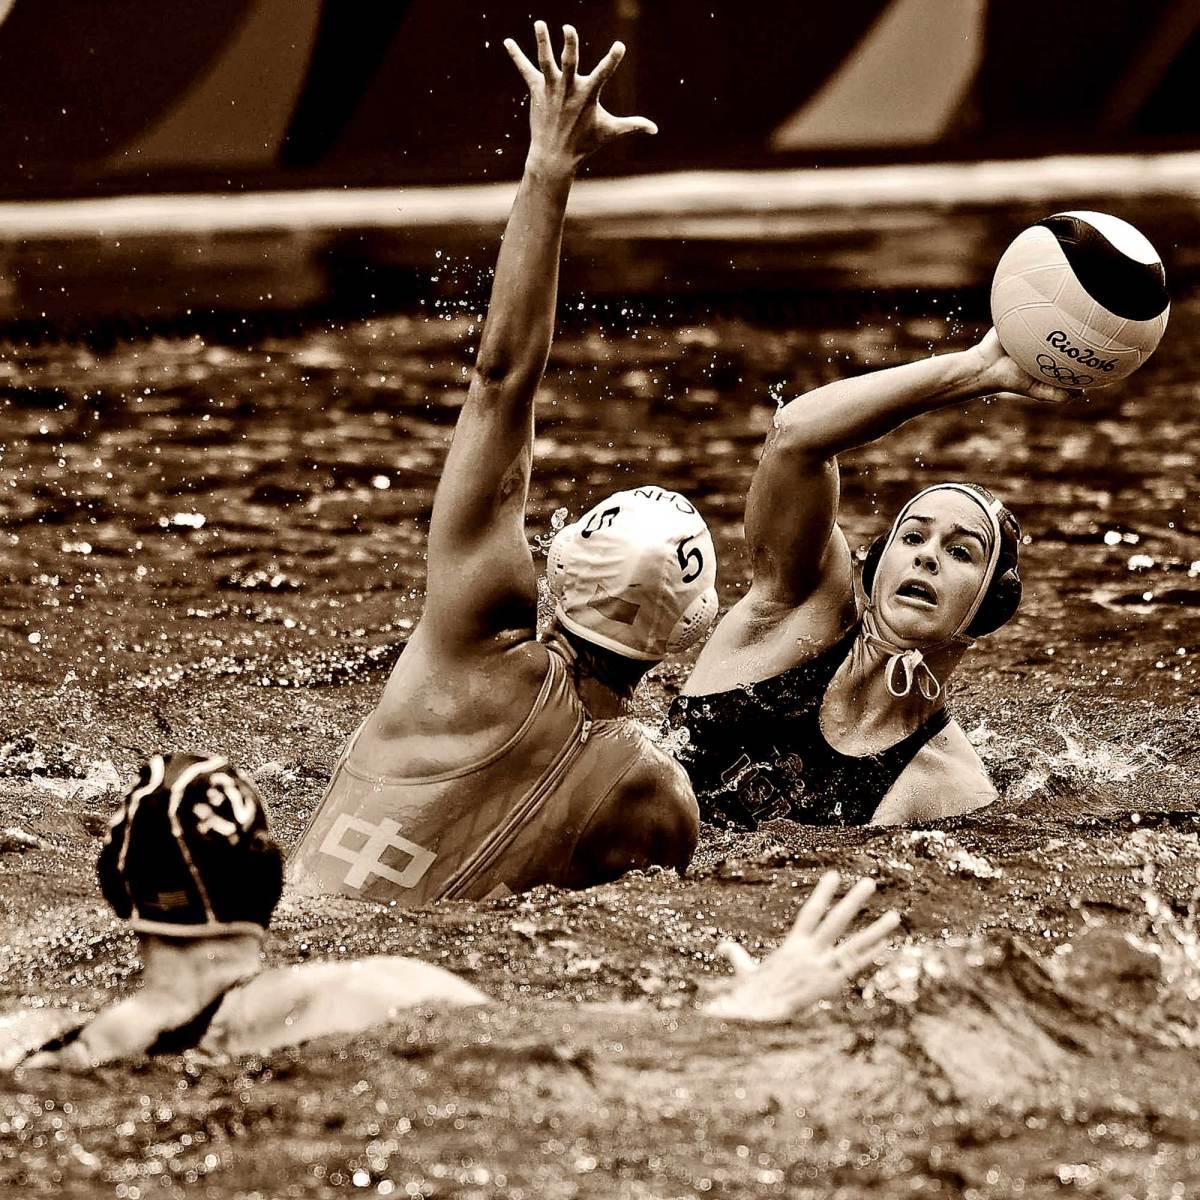 Best-photos-Day-6-2016-Rio-Olympics-26.jpg